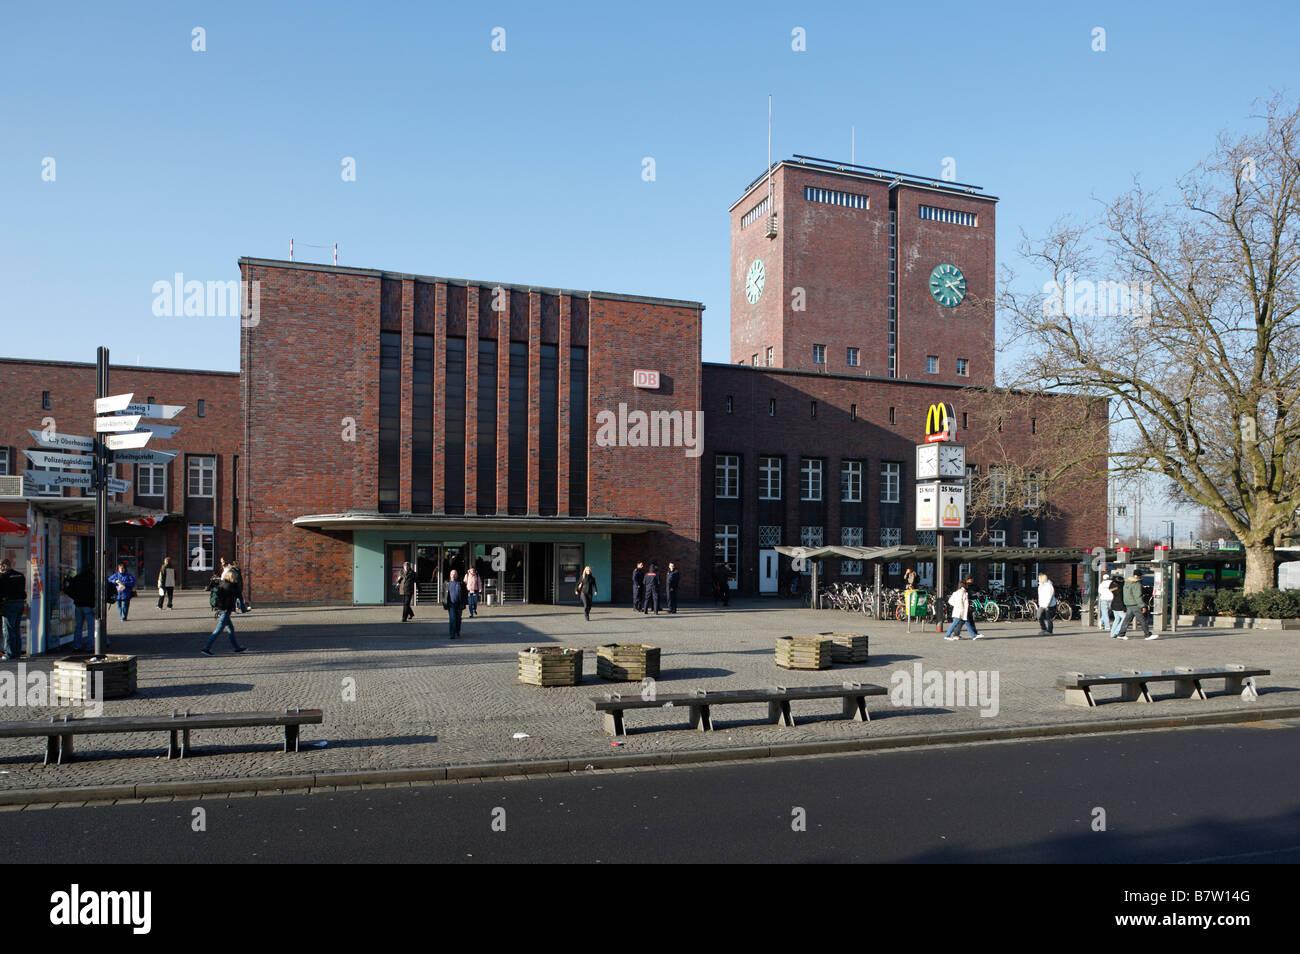 Architekt Oberhausen oberhausen hauptbahnhof stadtseite 1930 bis 1934 erbaut